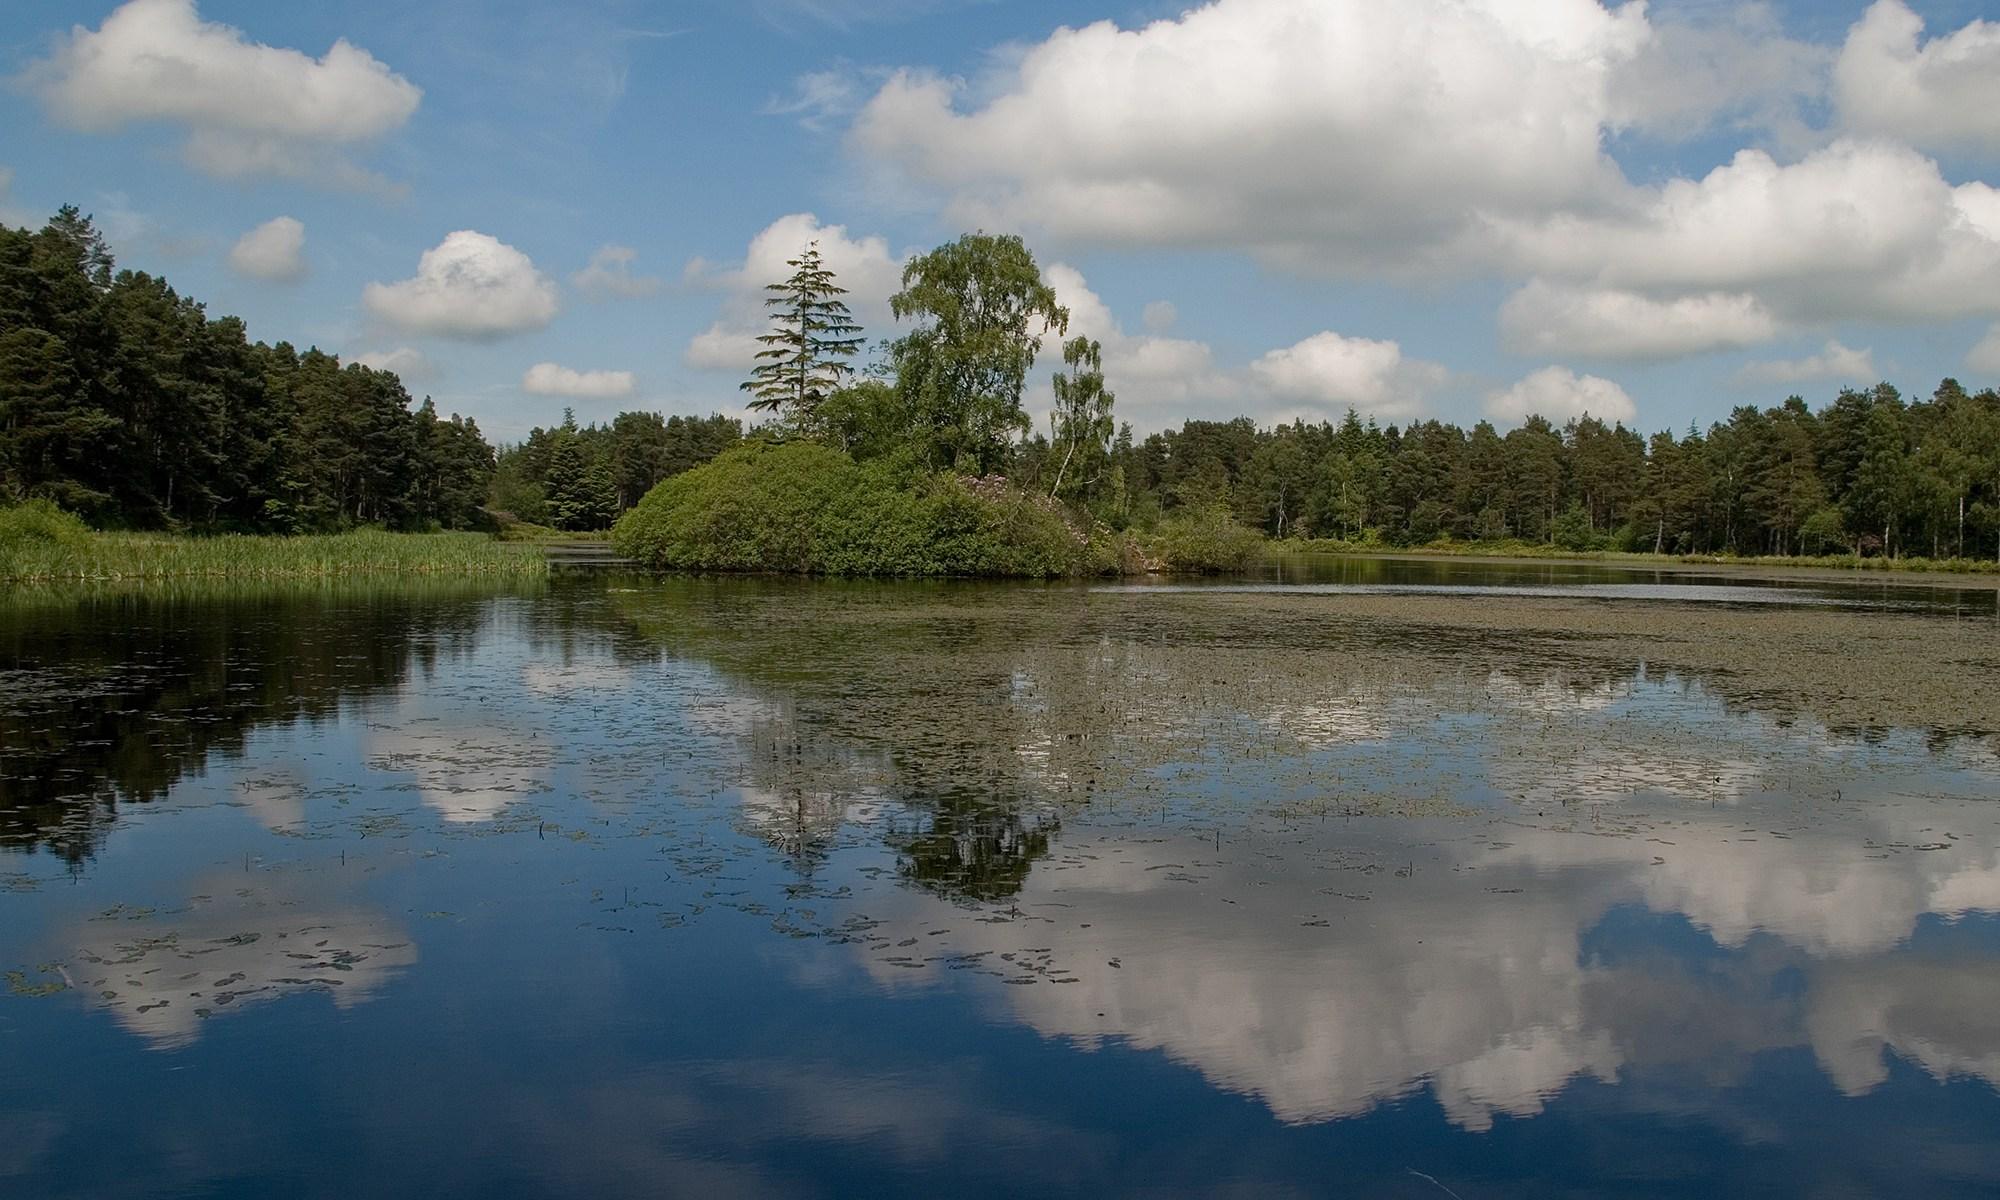 North Nelly Moss Lake, Cragside Estate